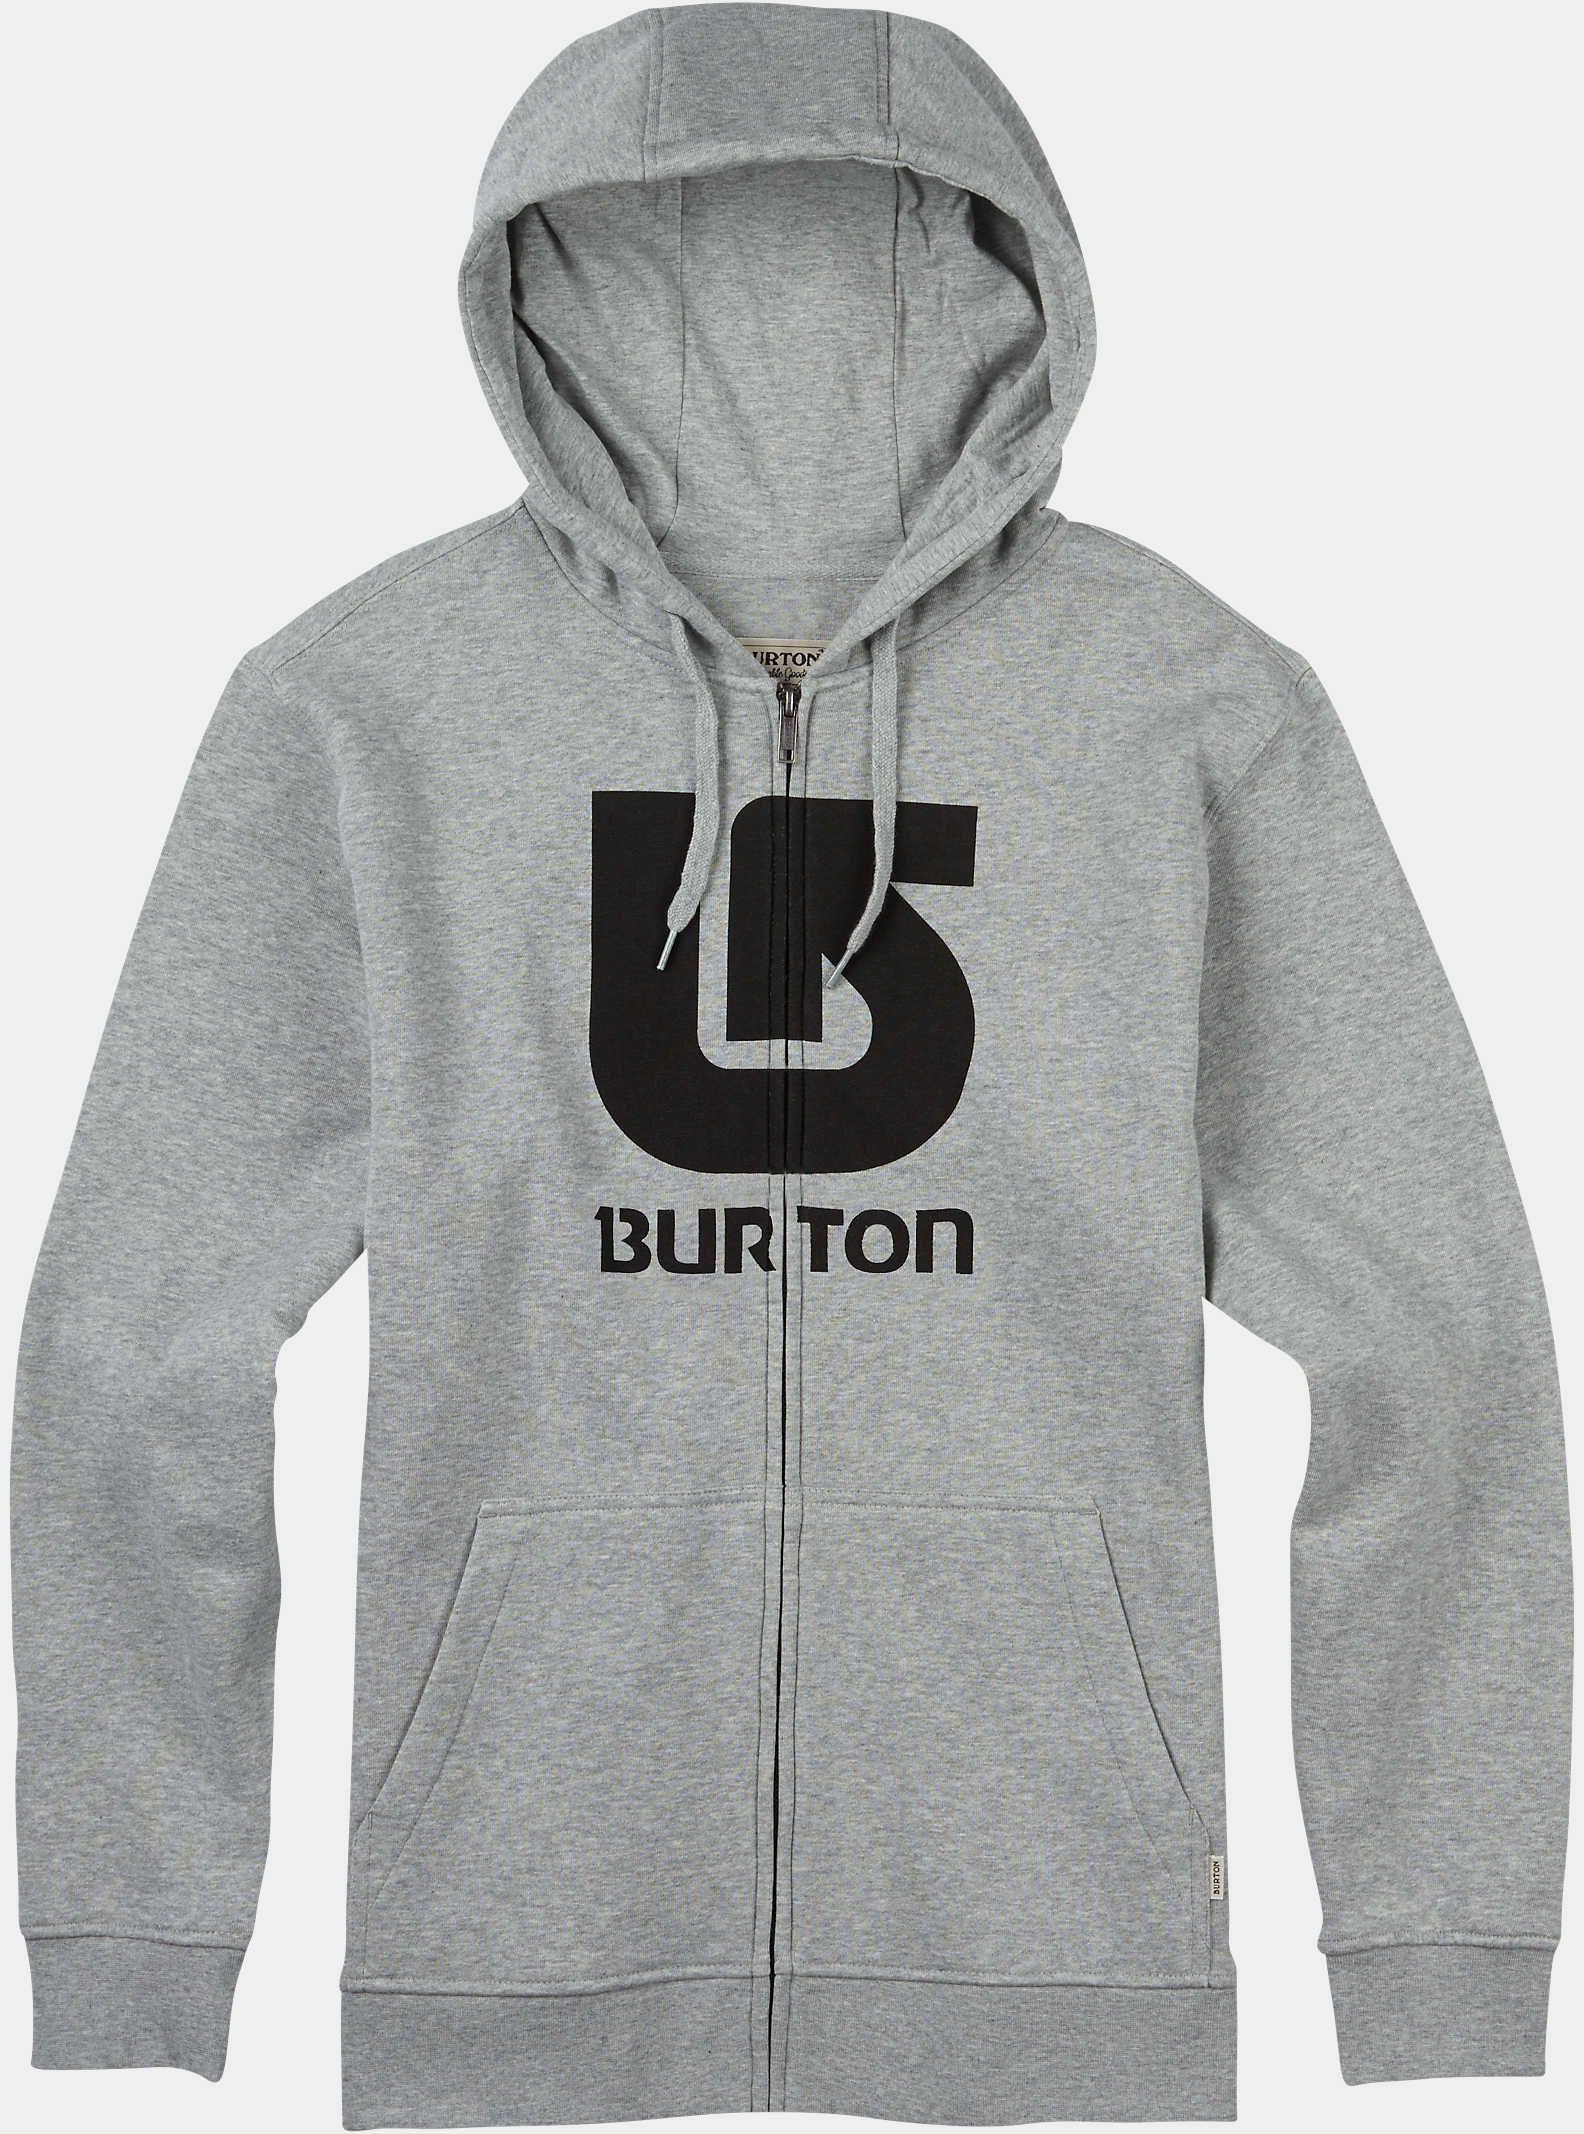 Burton Logo Vertical Full-Zip Hoodie  e6423c4cf5